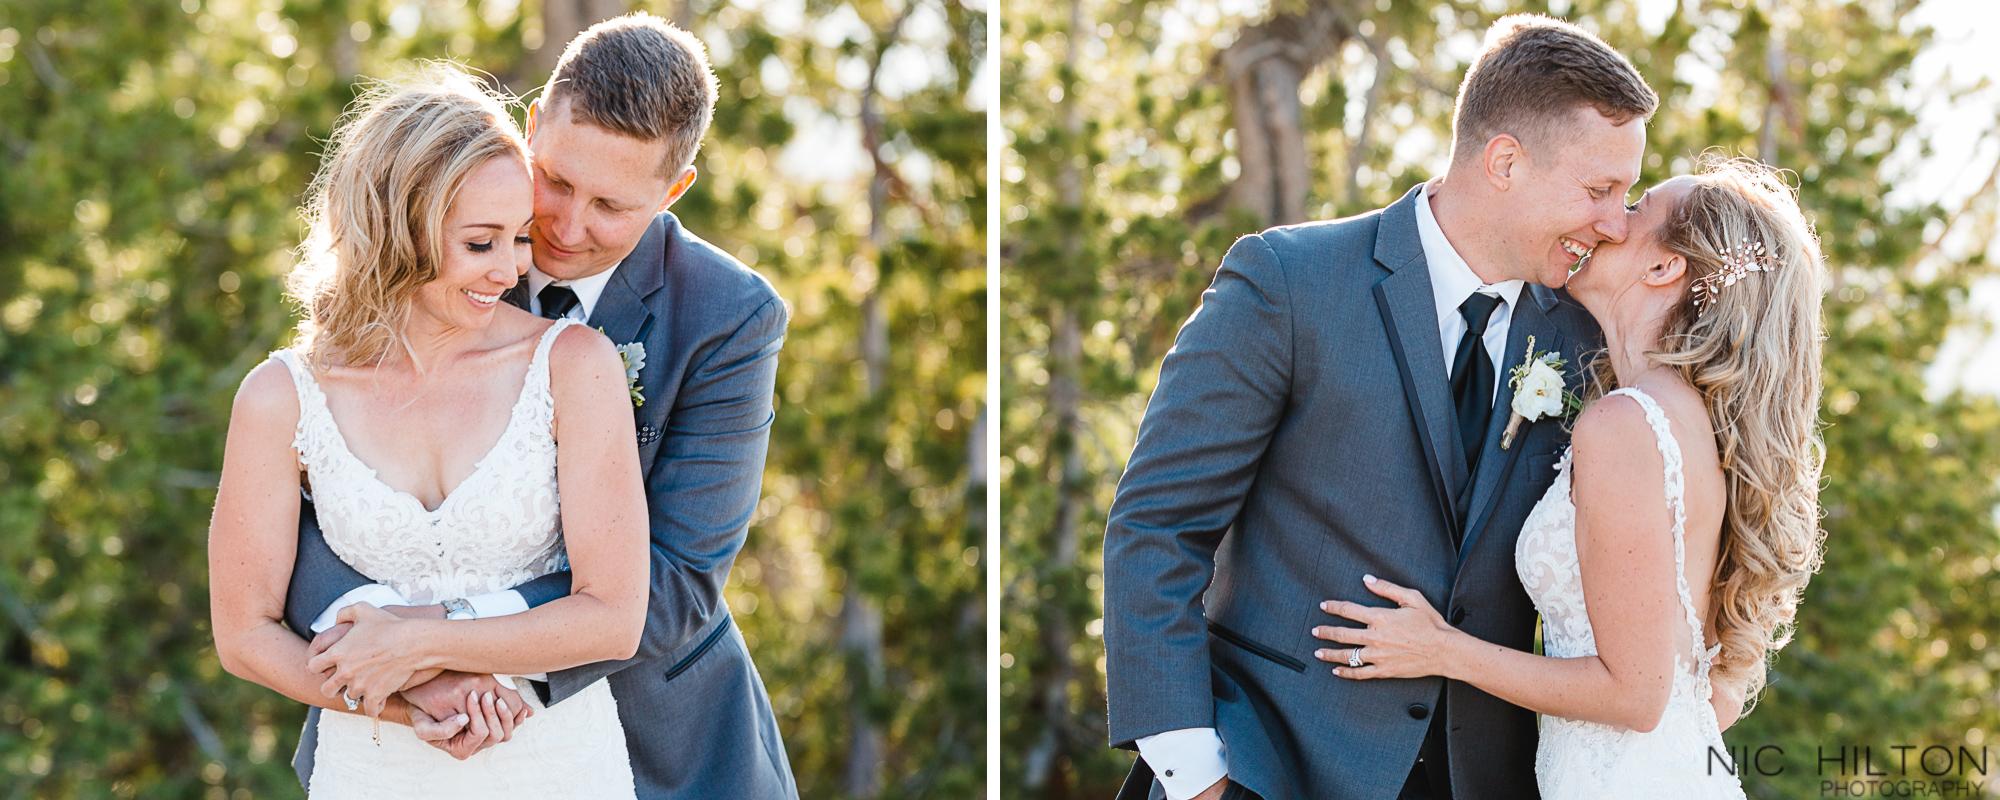 Bride-and-groom-mammoth-mountain-wedding.jpg